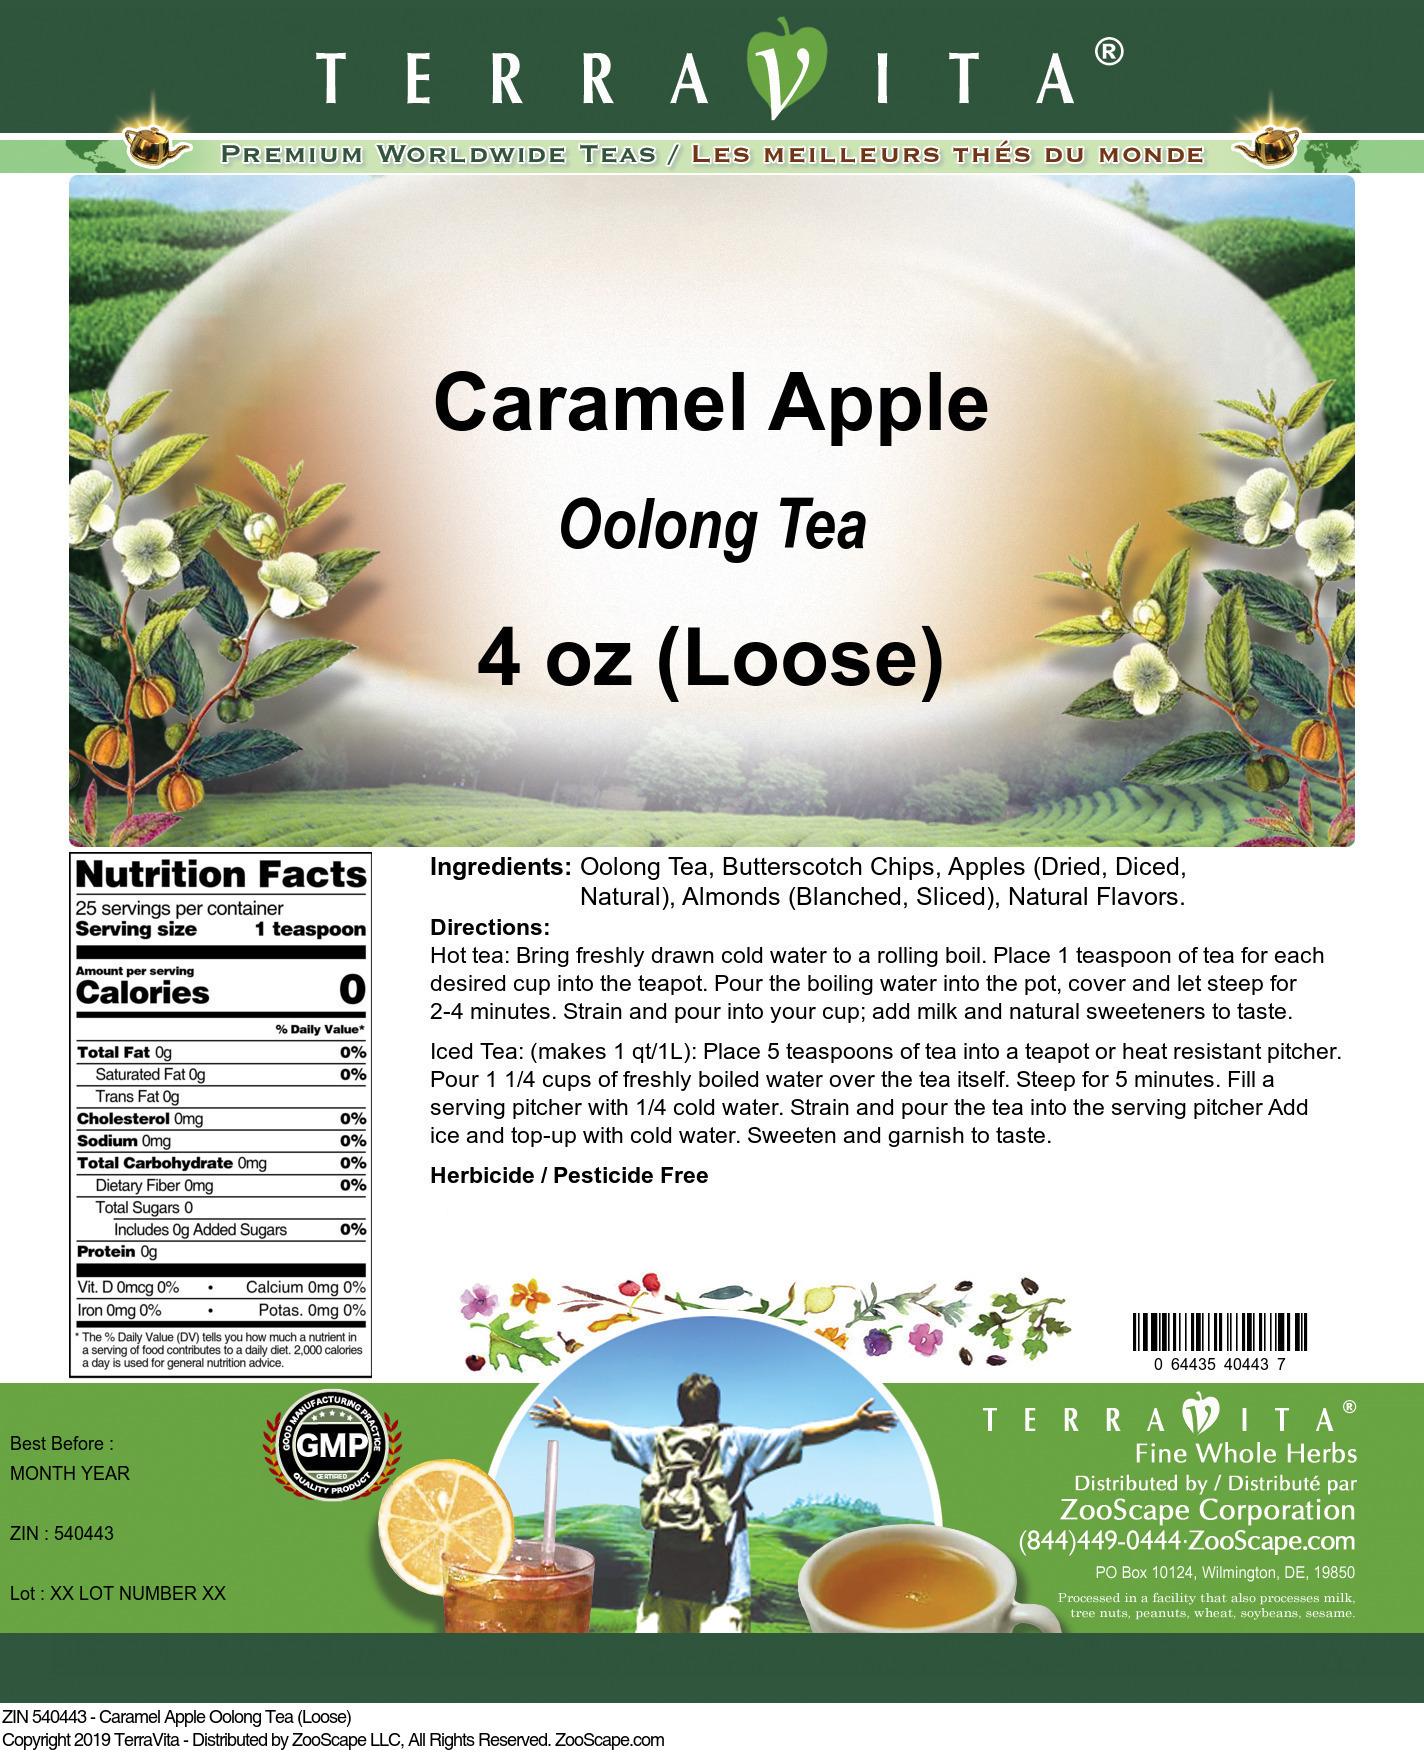 Caramel Apple Oolong Tea (Loose)